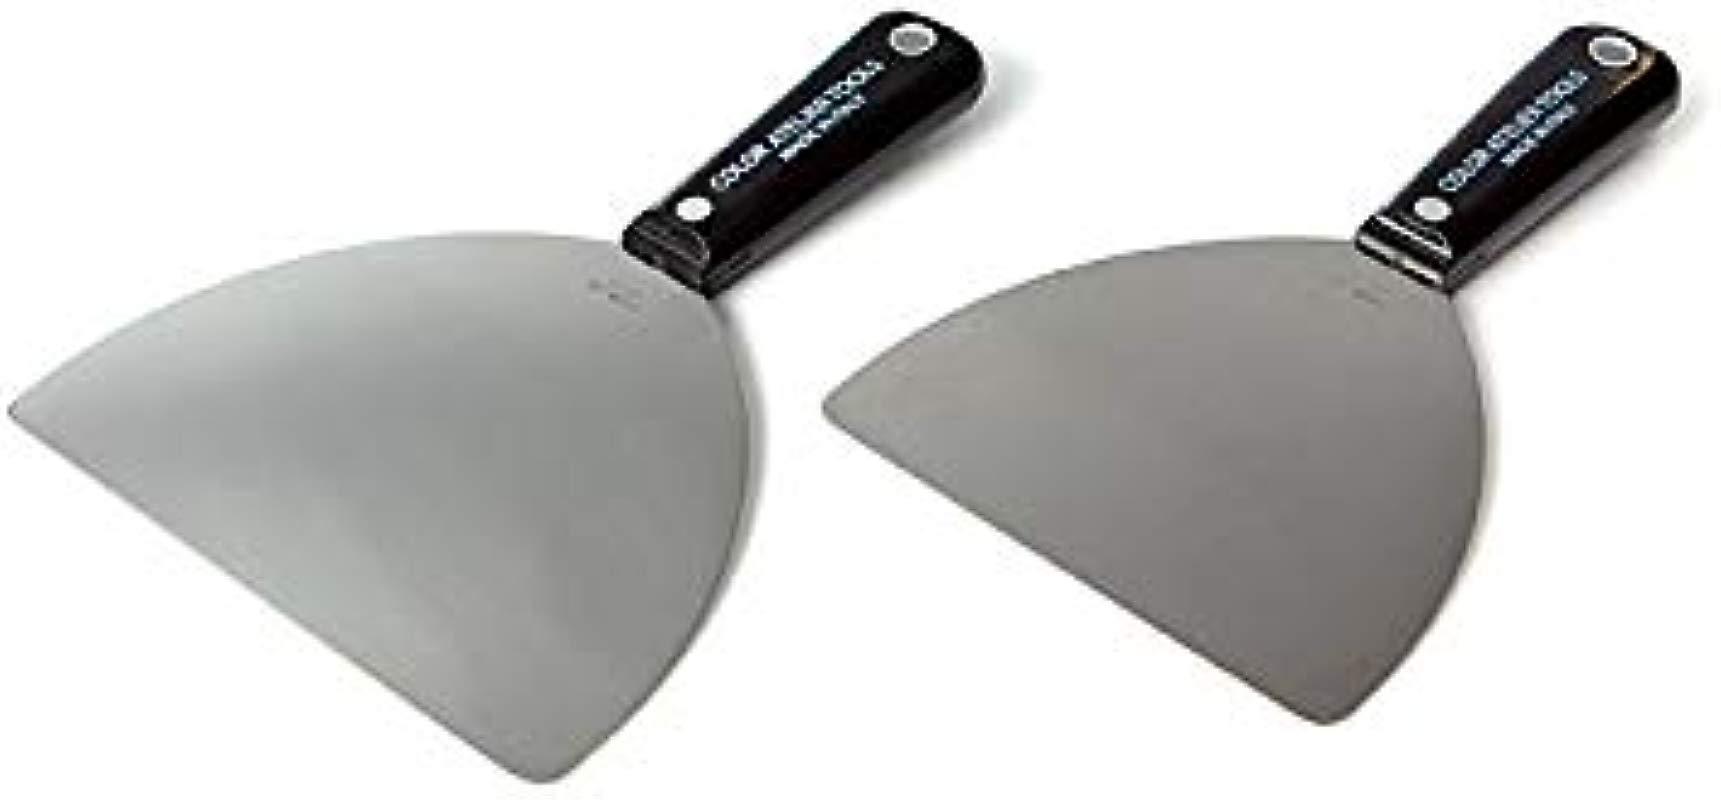 Stainless Steel Plaster Spatula Medium